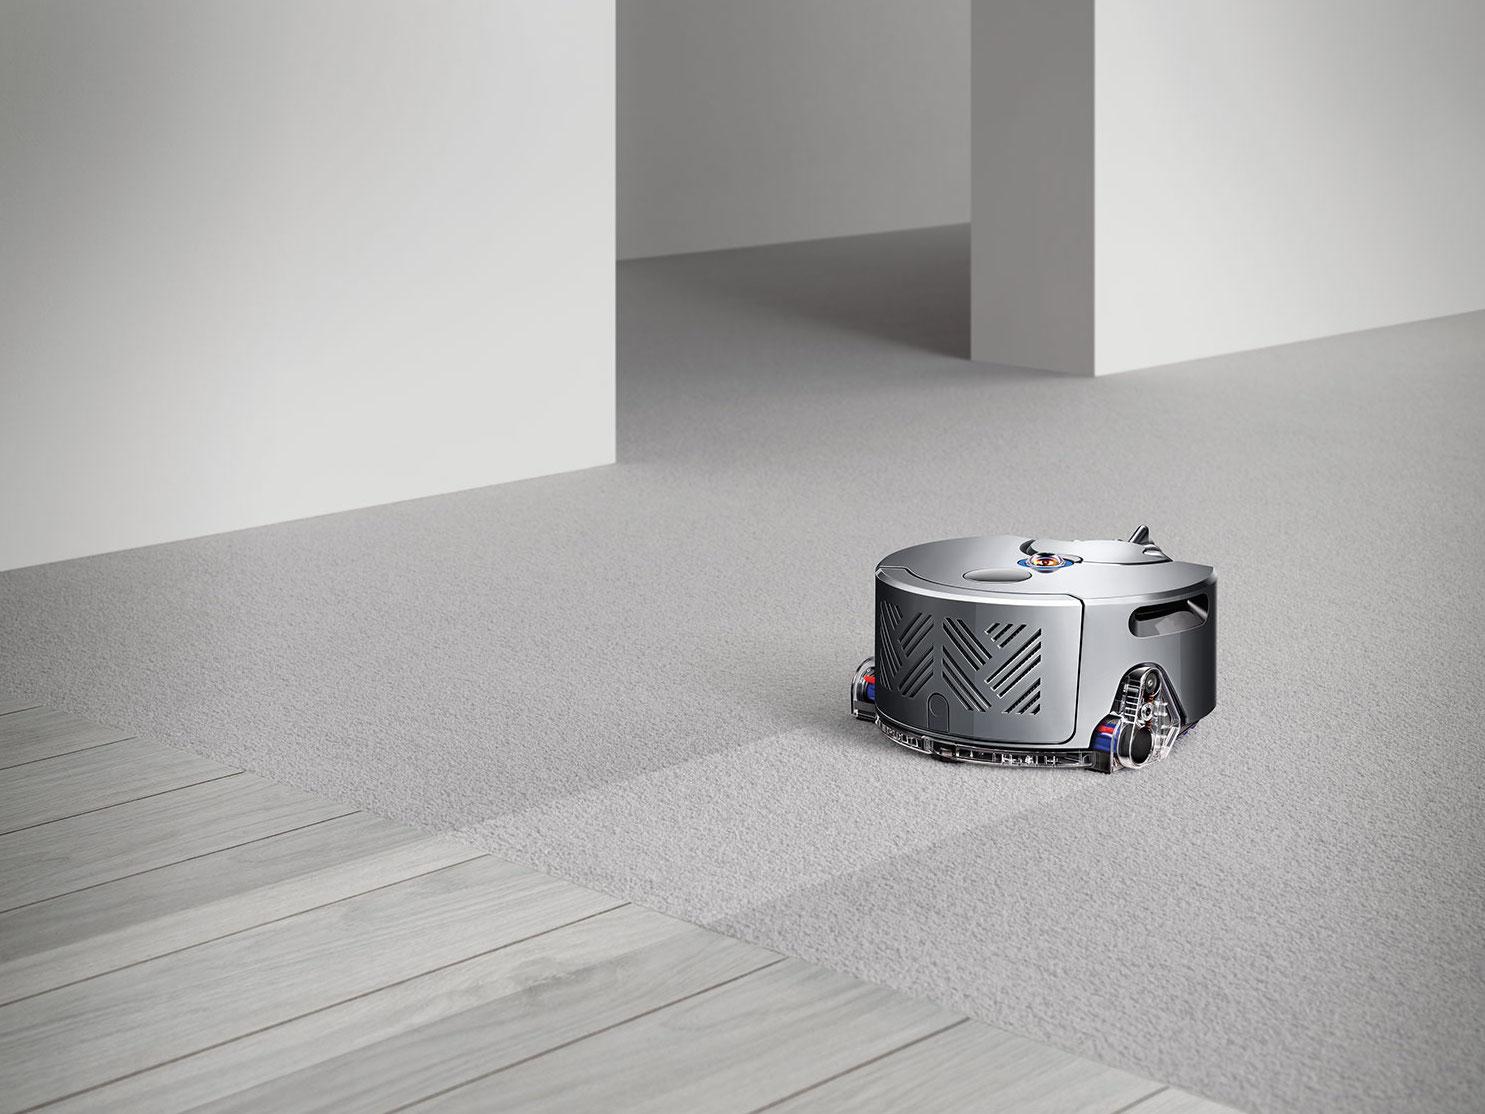 robot vacuum - dyson 360 eye carpet